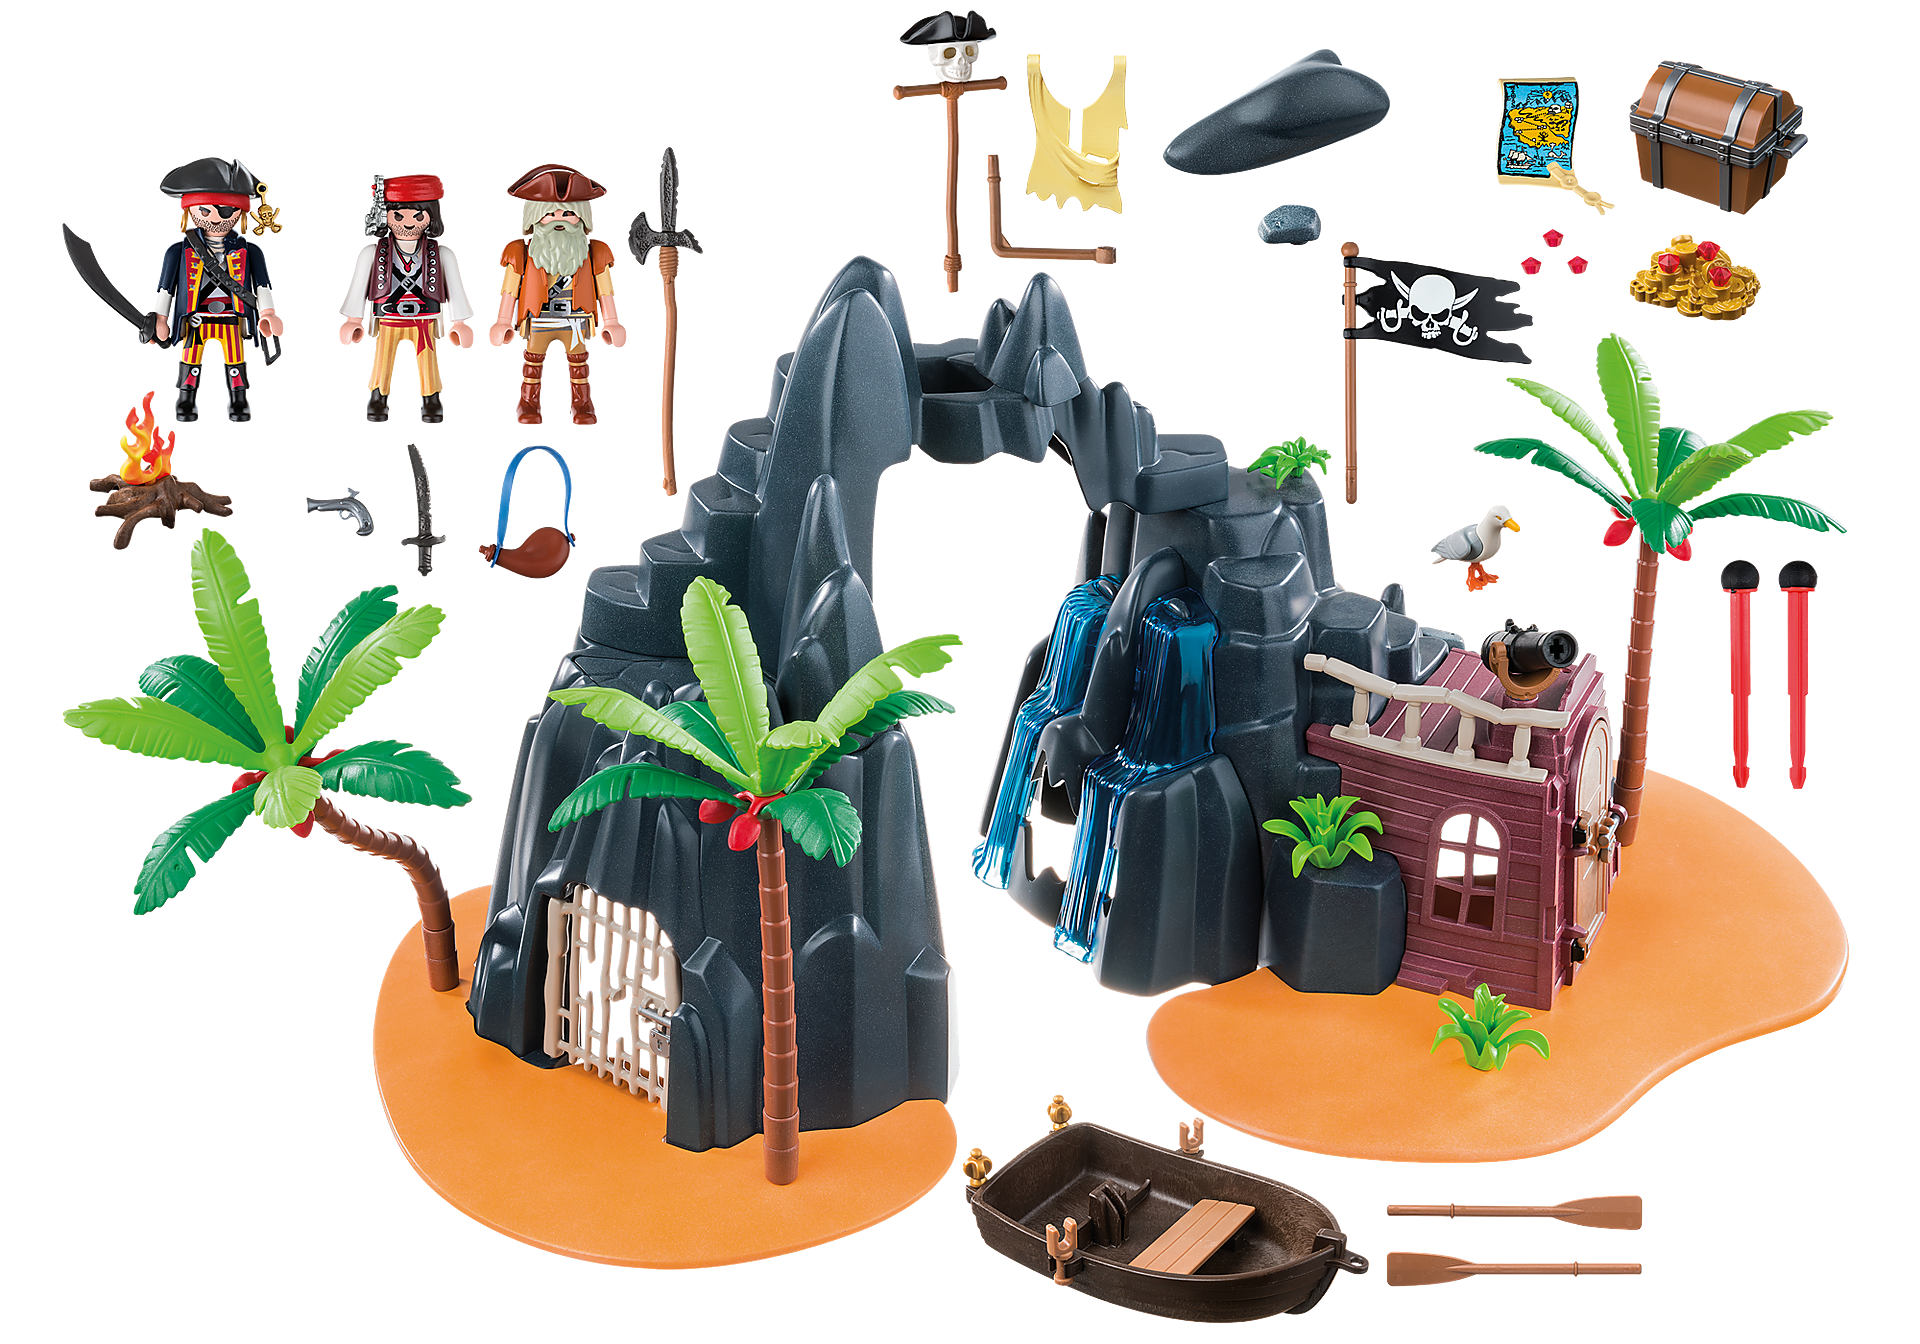 6679 Isola del tesoro fortificata zoom image4